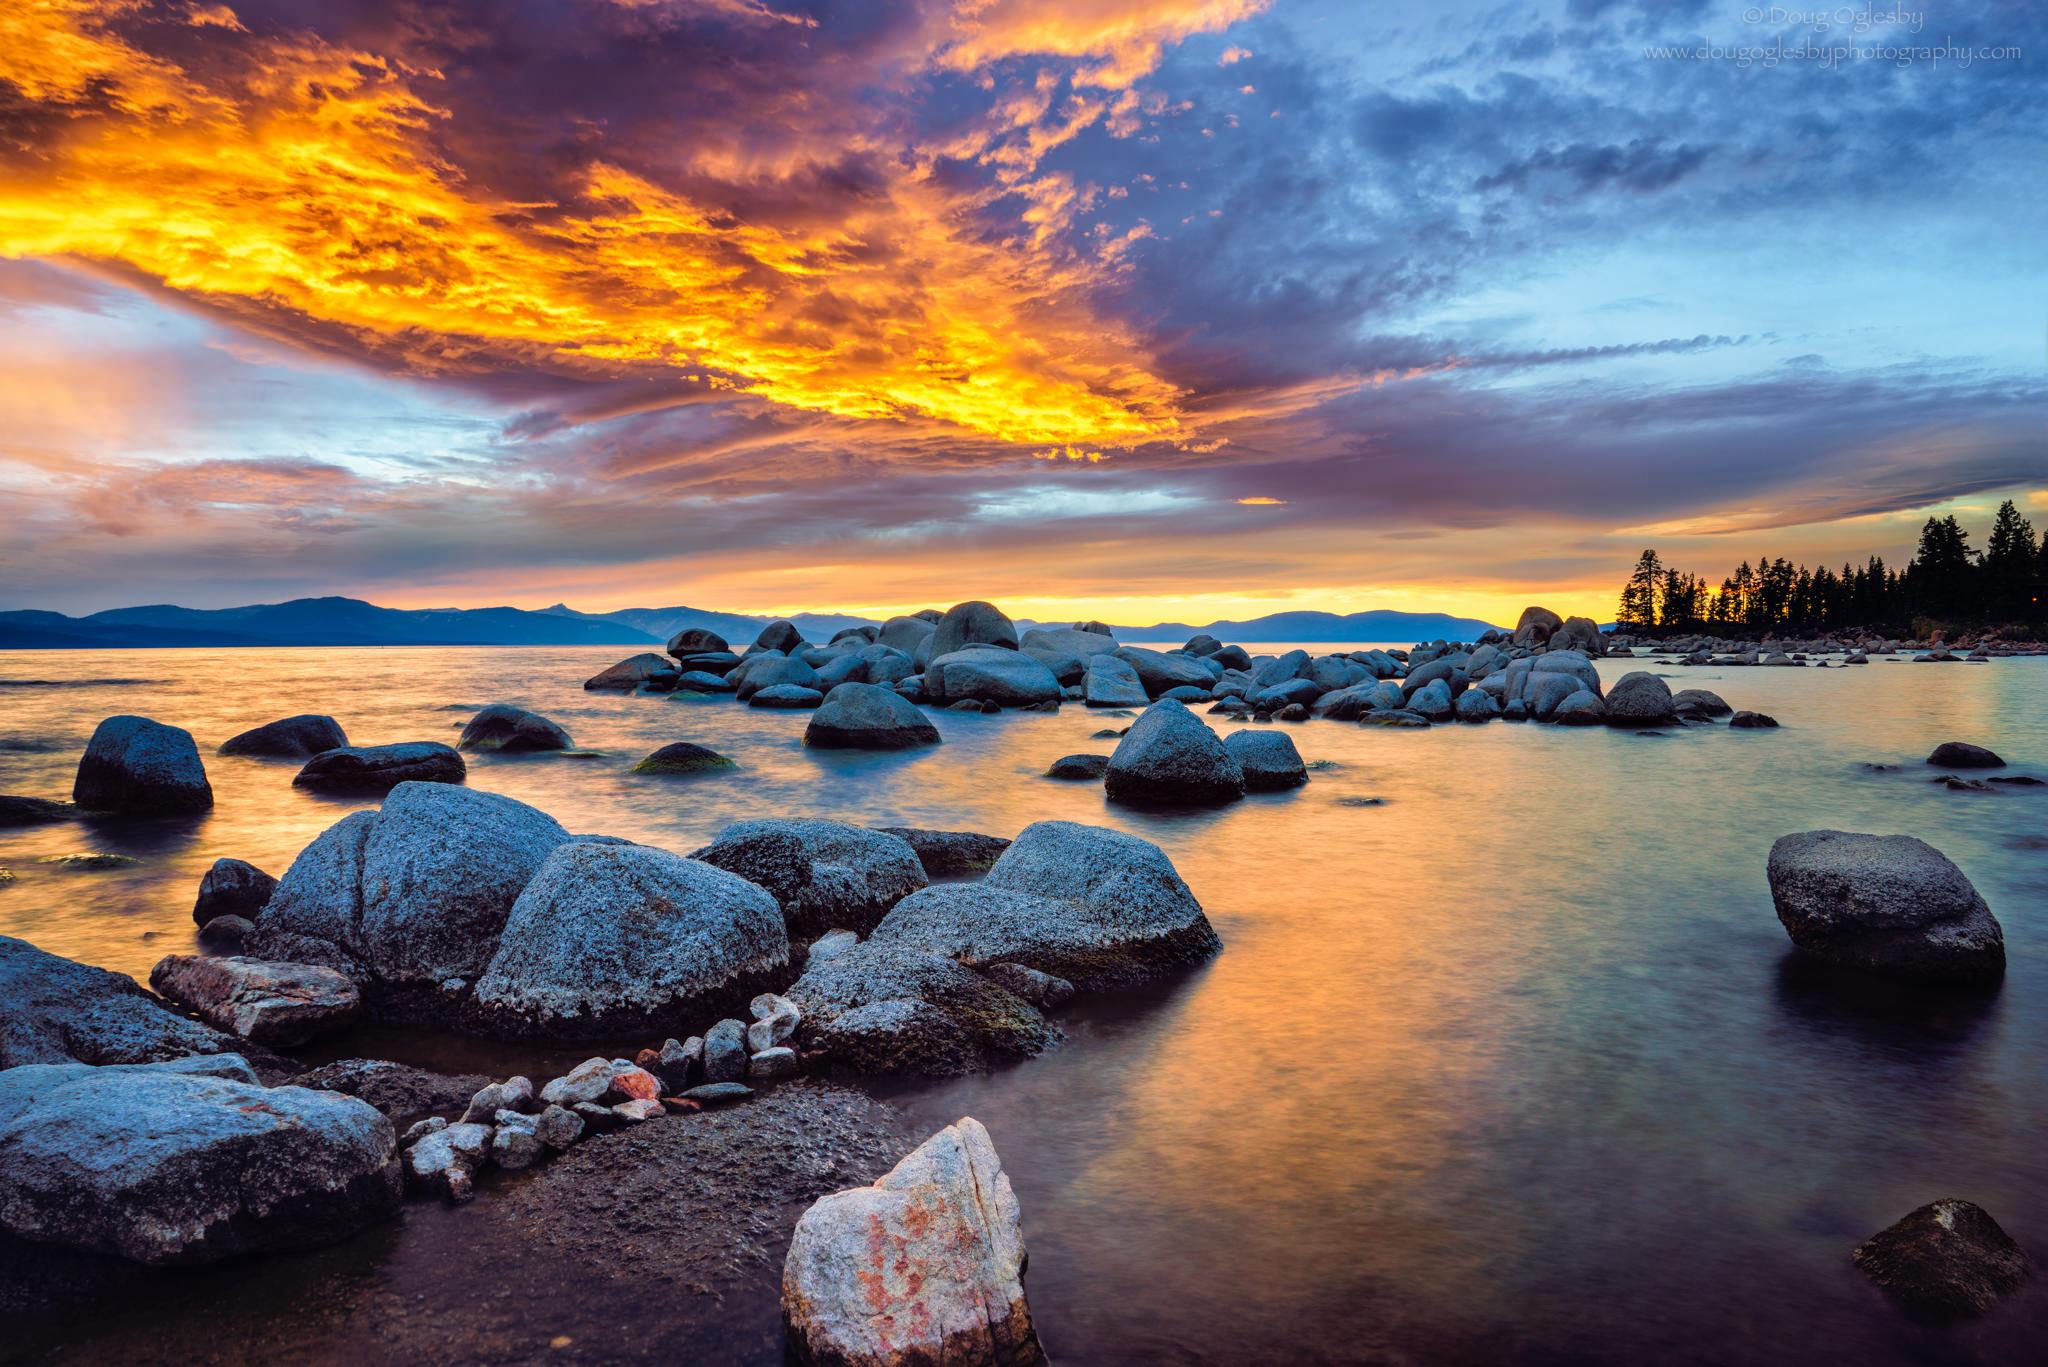 © Golden Zephyr Cove. Lake Tahoe, Nevada. Photograph by Doug Oglesby. photo@dougoglesby.com A PHOTOGRAPHY WORLD Article, Beautiful Lake Tahoe @photographyworld.org